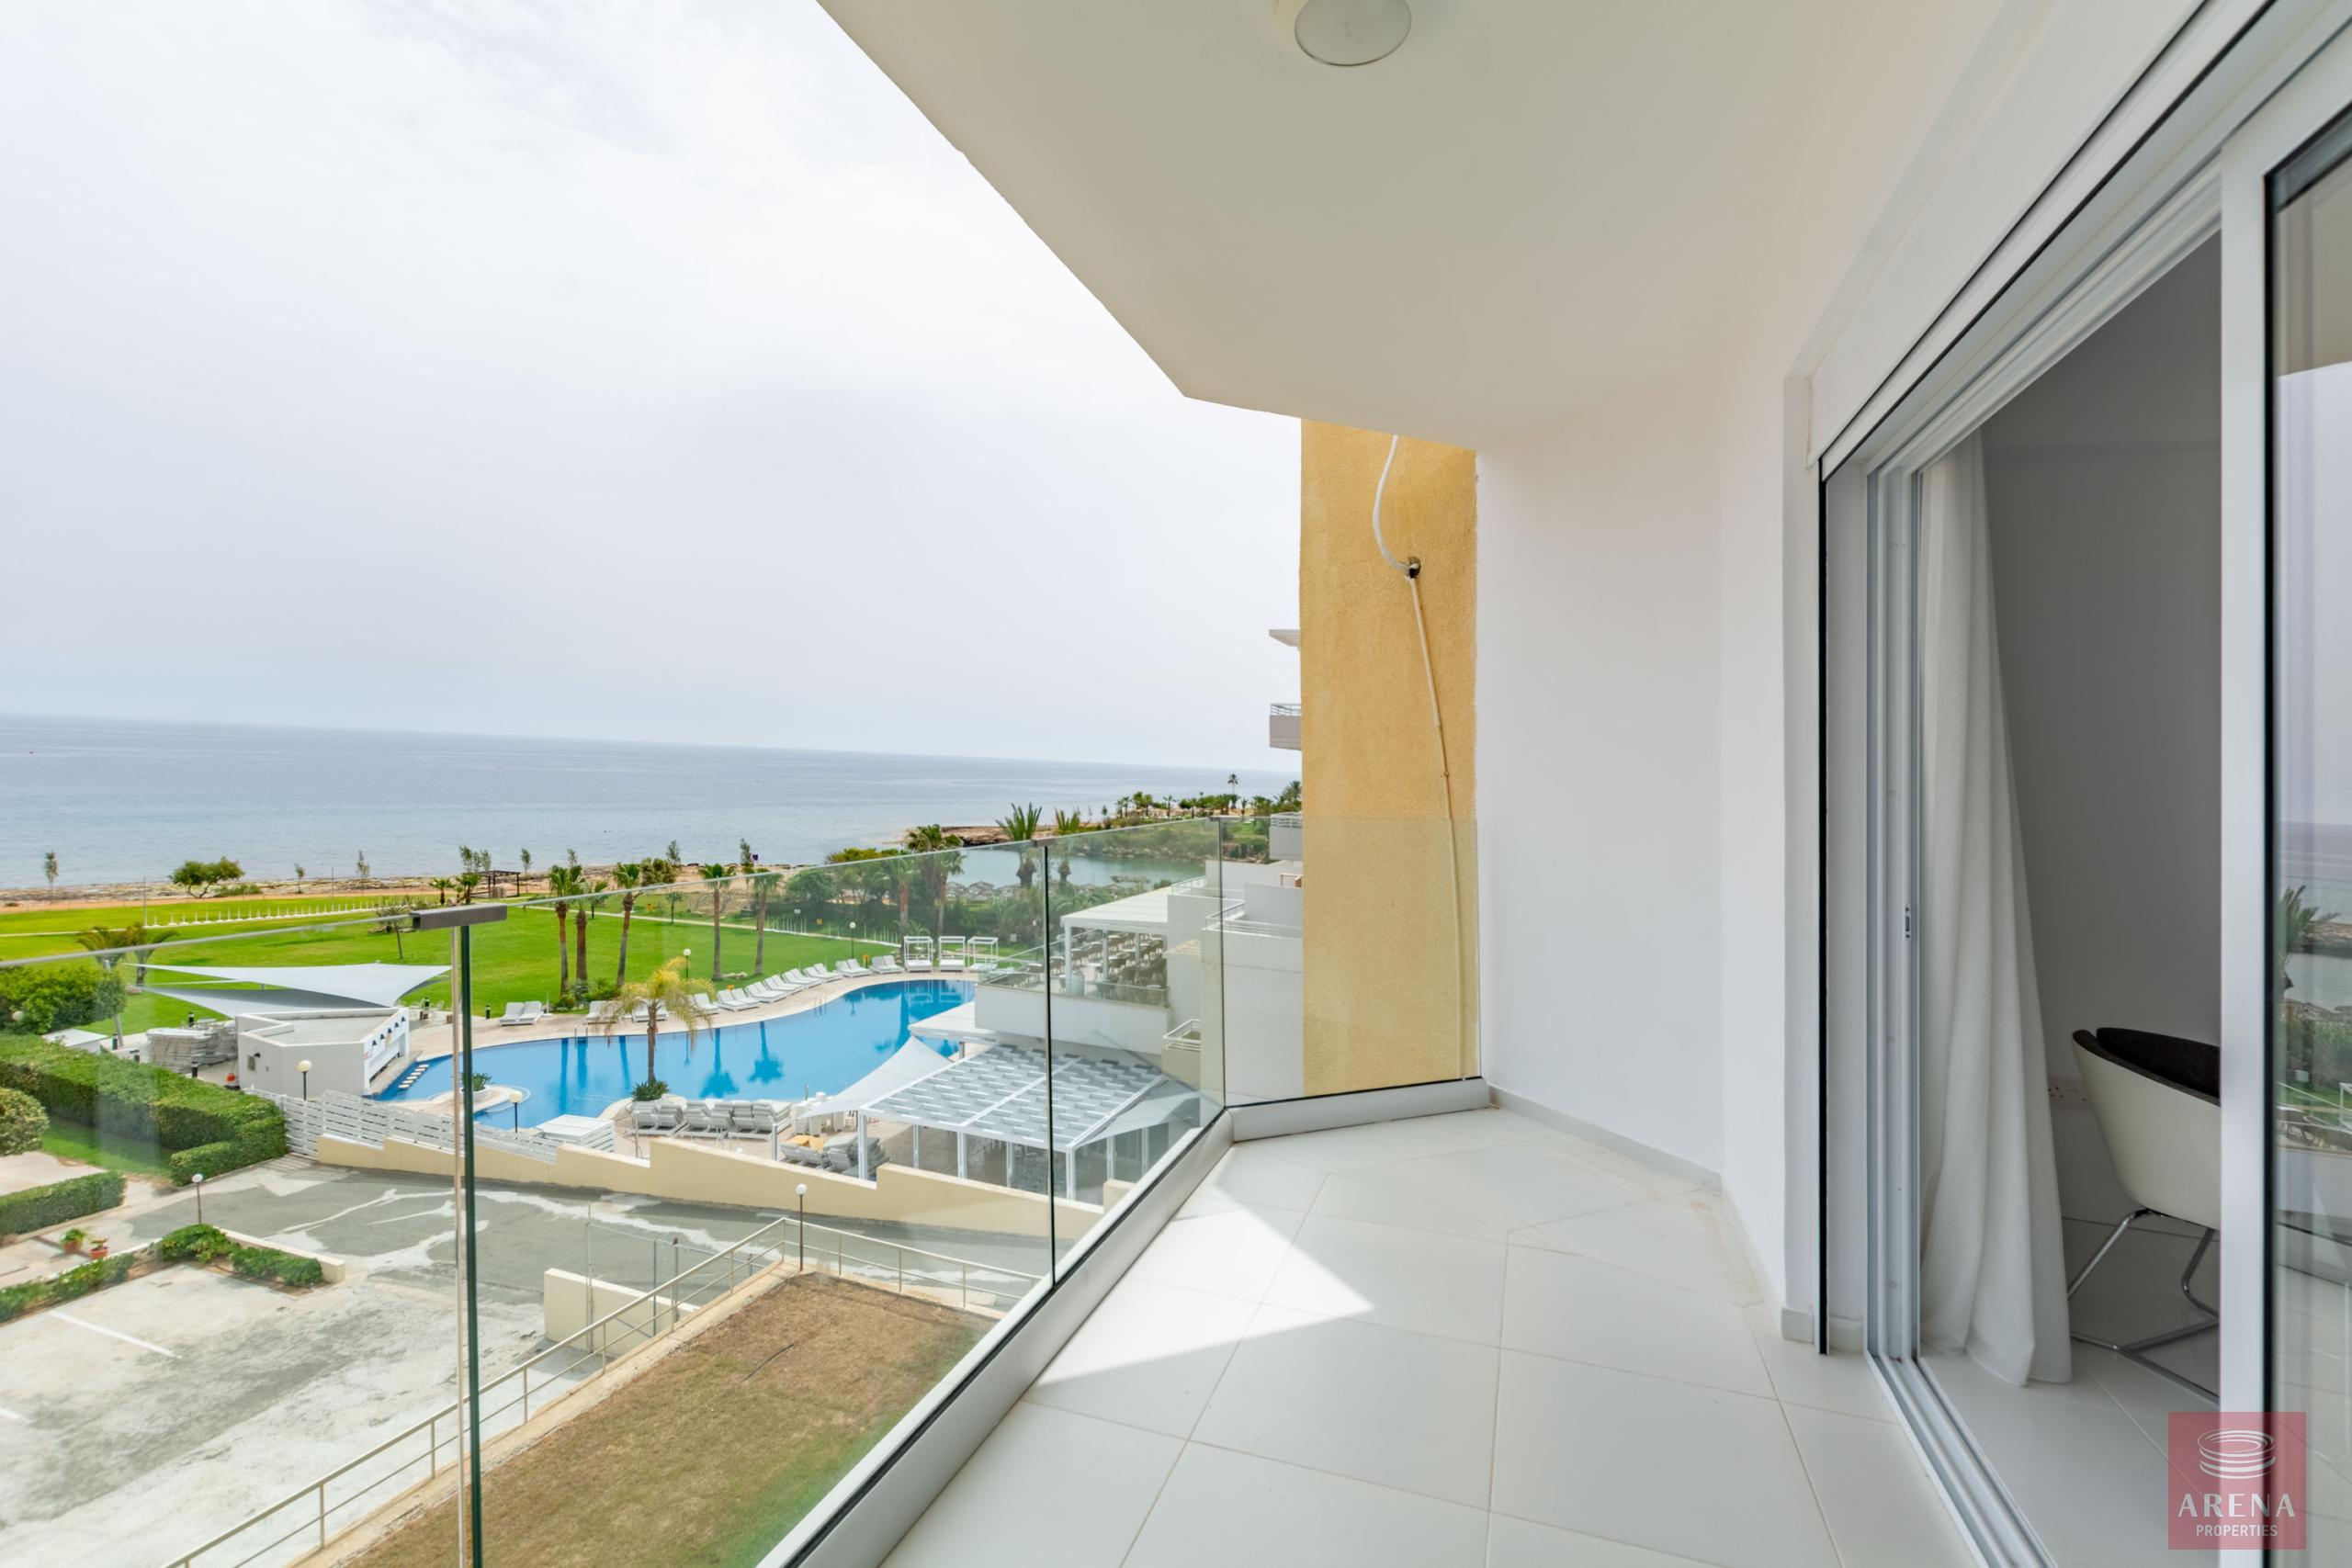 Apartment in Ayia Triada - veranda